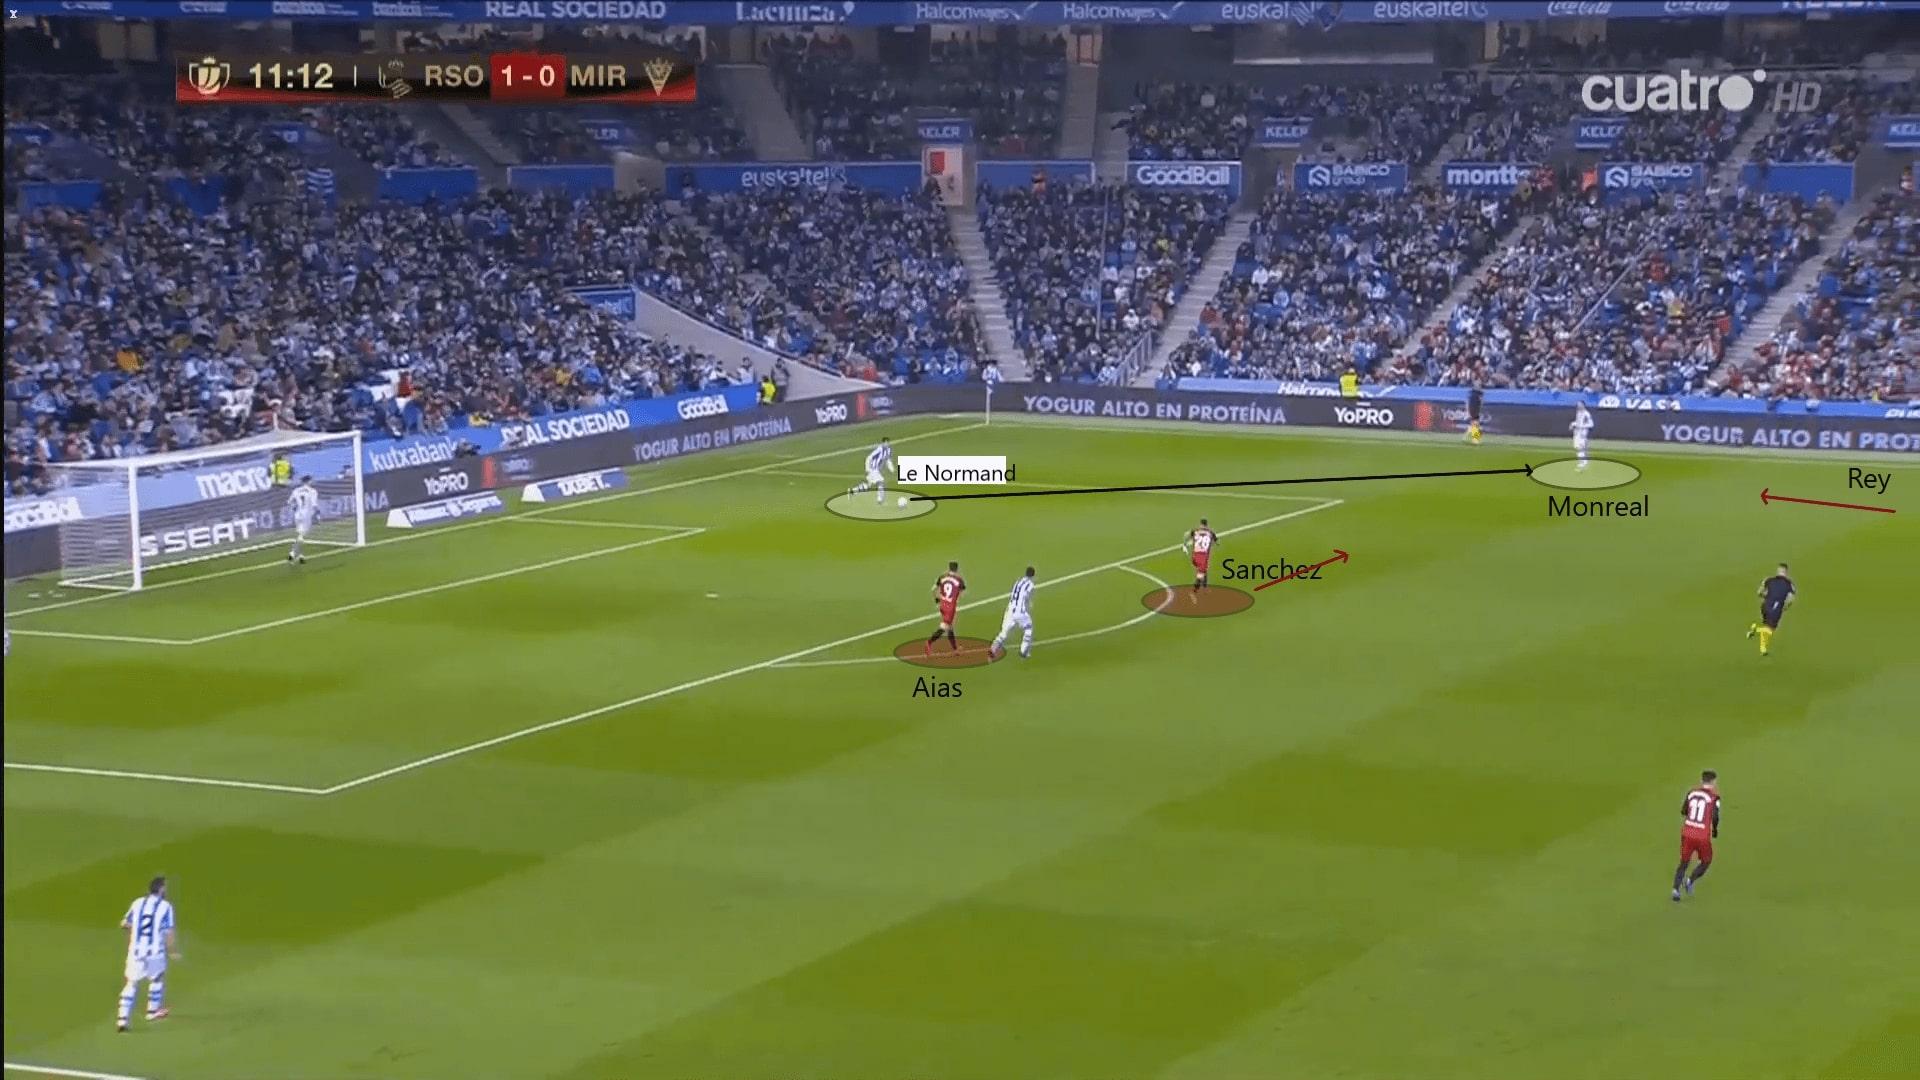 Copa del Rey 2019/20: Real Sociedad vs Mirandes - tactical analysis tactics